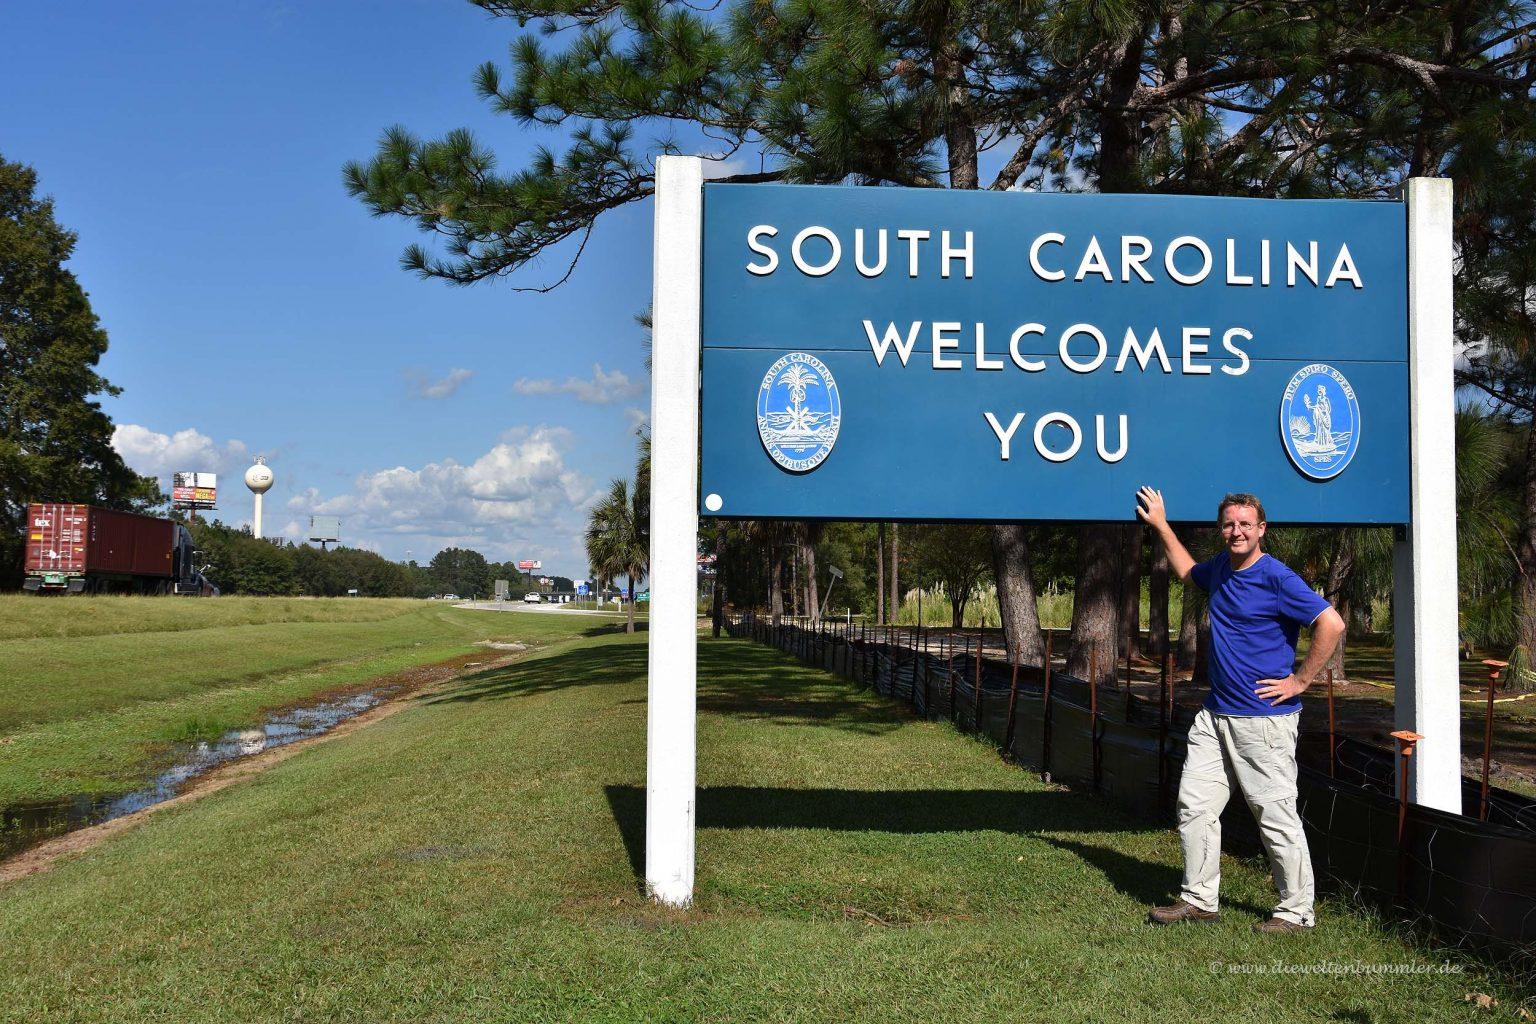 Michael Moll in South Carolina